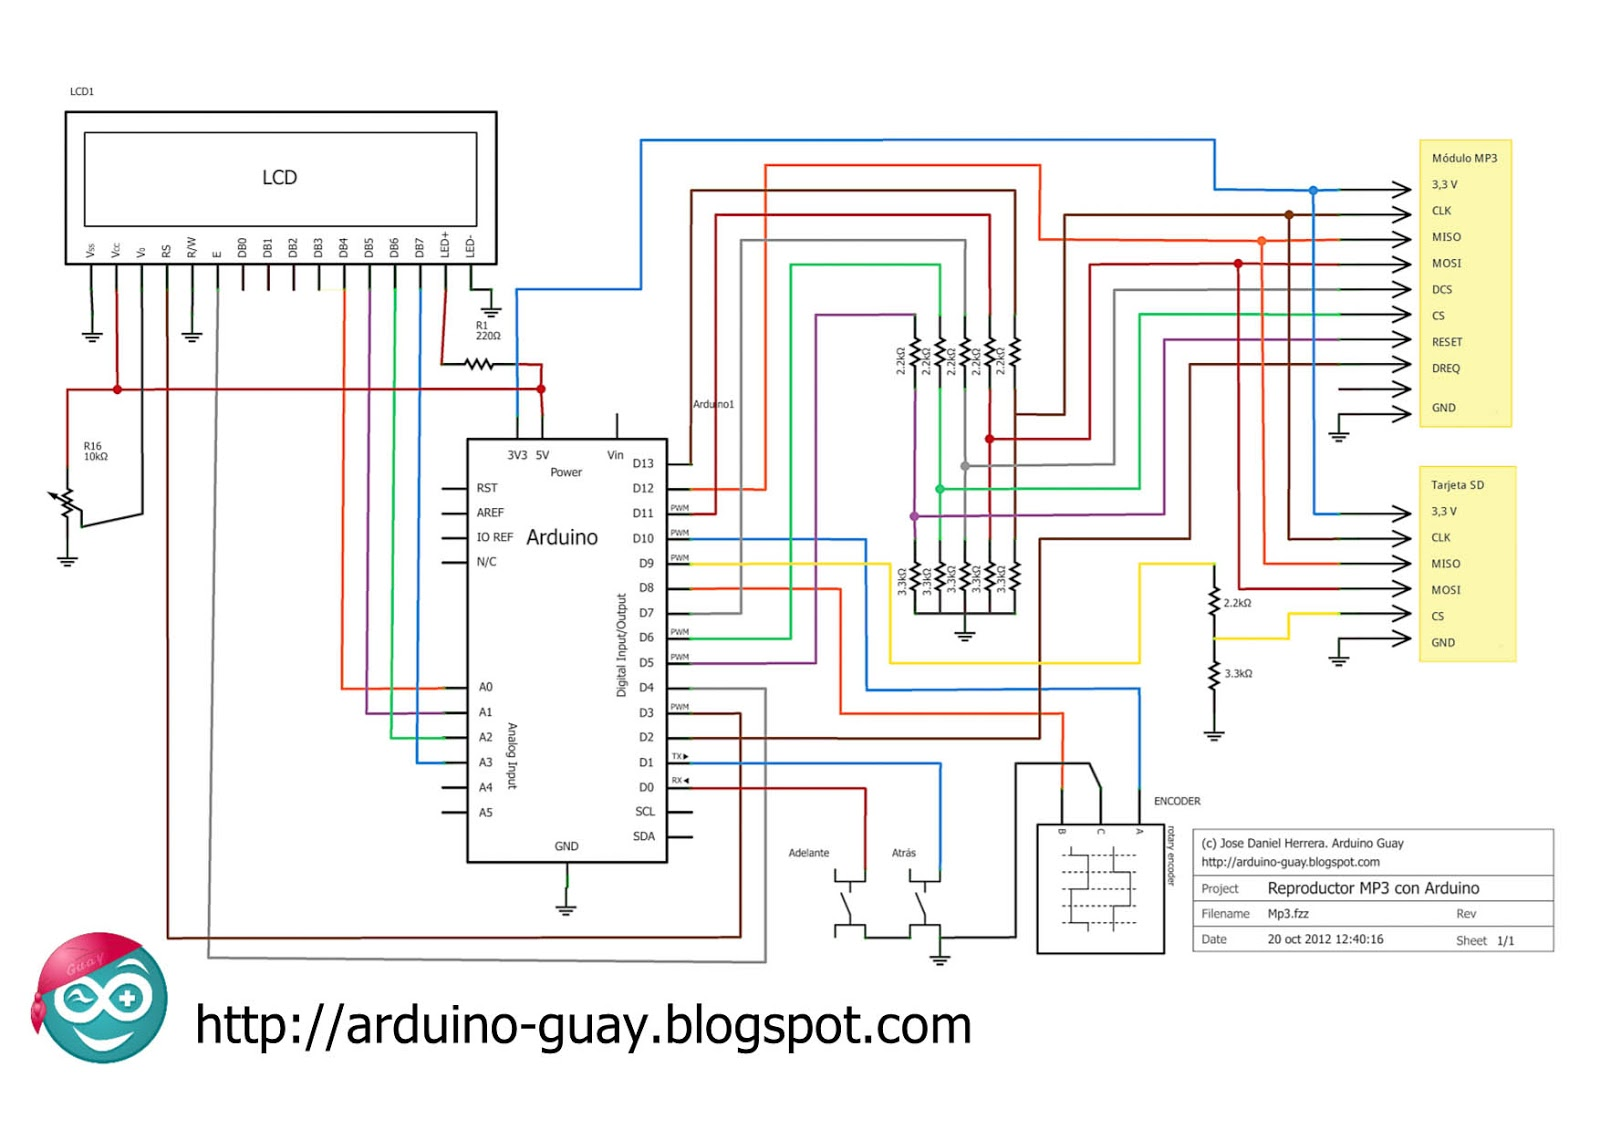 Circuito Arduino : Reproductor mp con arduino i arduino guay